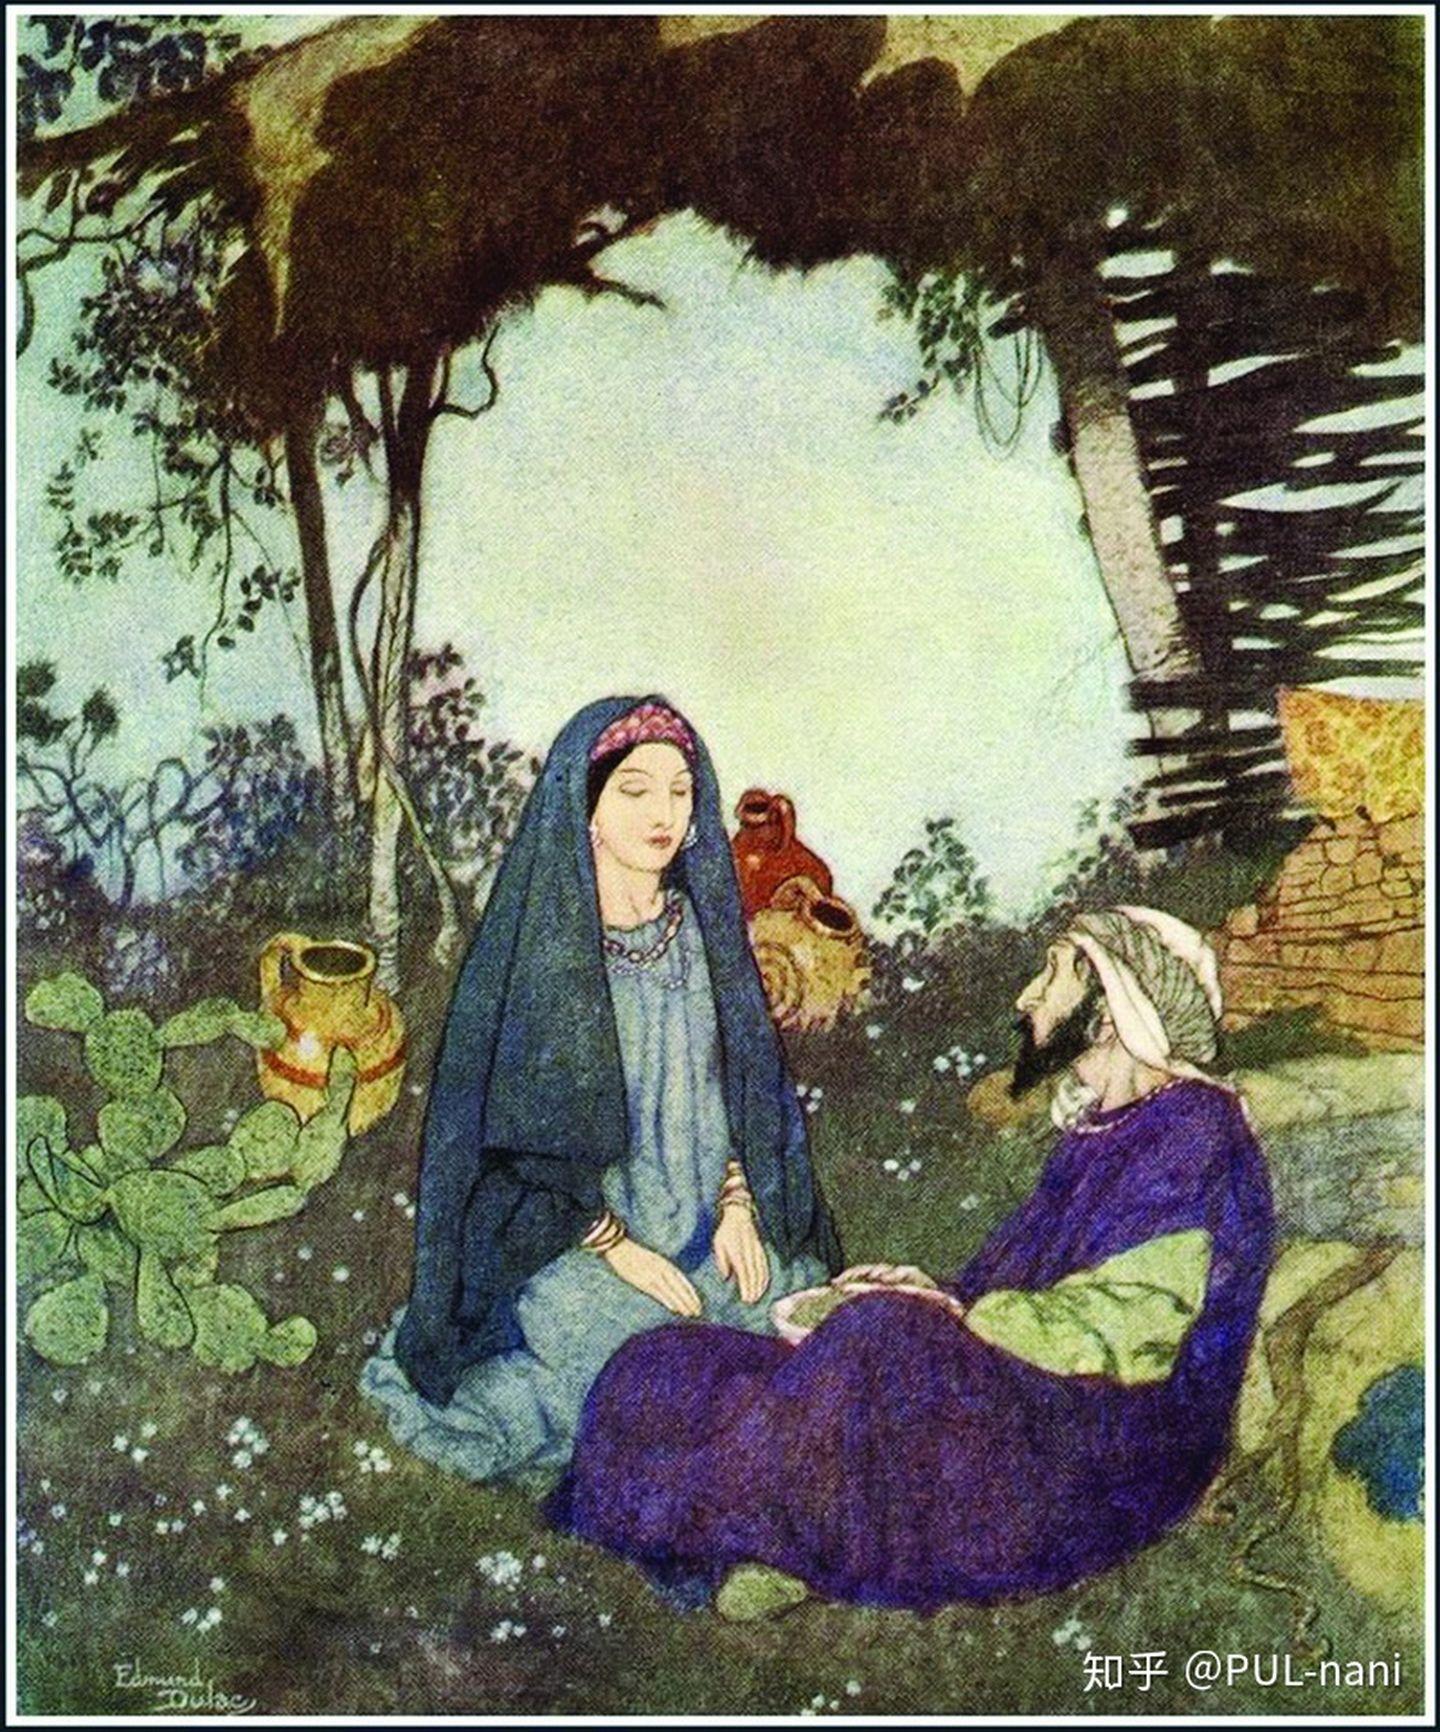 LAYLA & MAJNUN: Nasib Cinta Perempuan Arab pada Abad ke-7